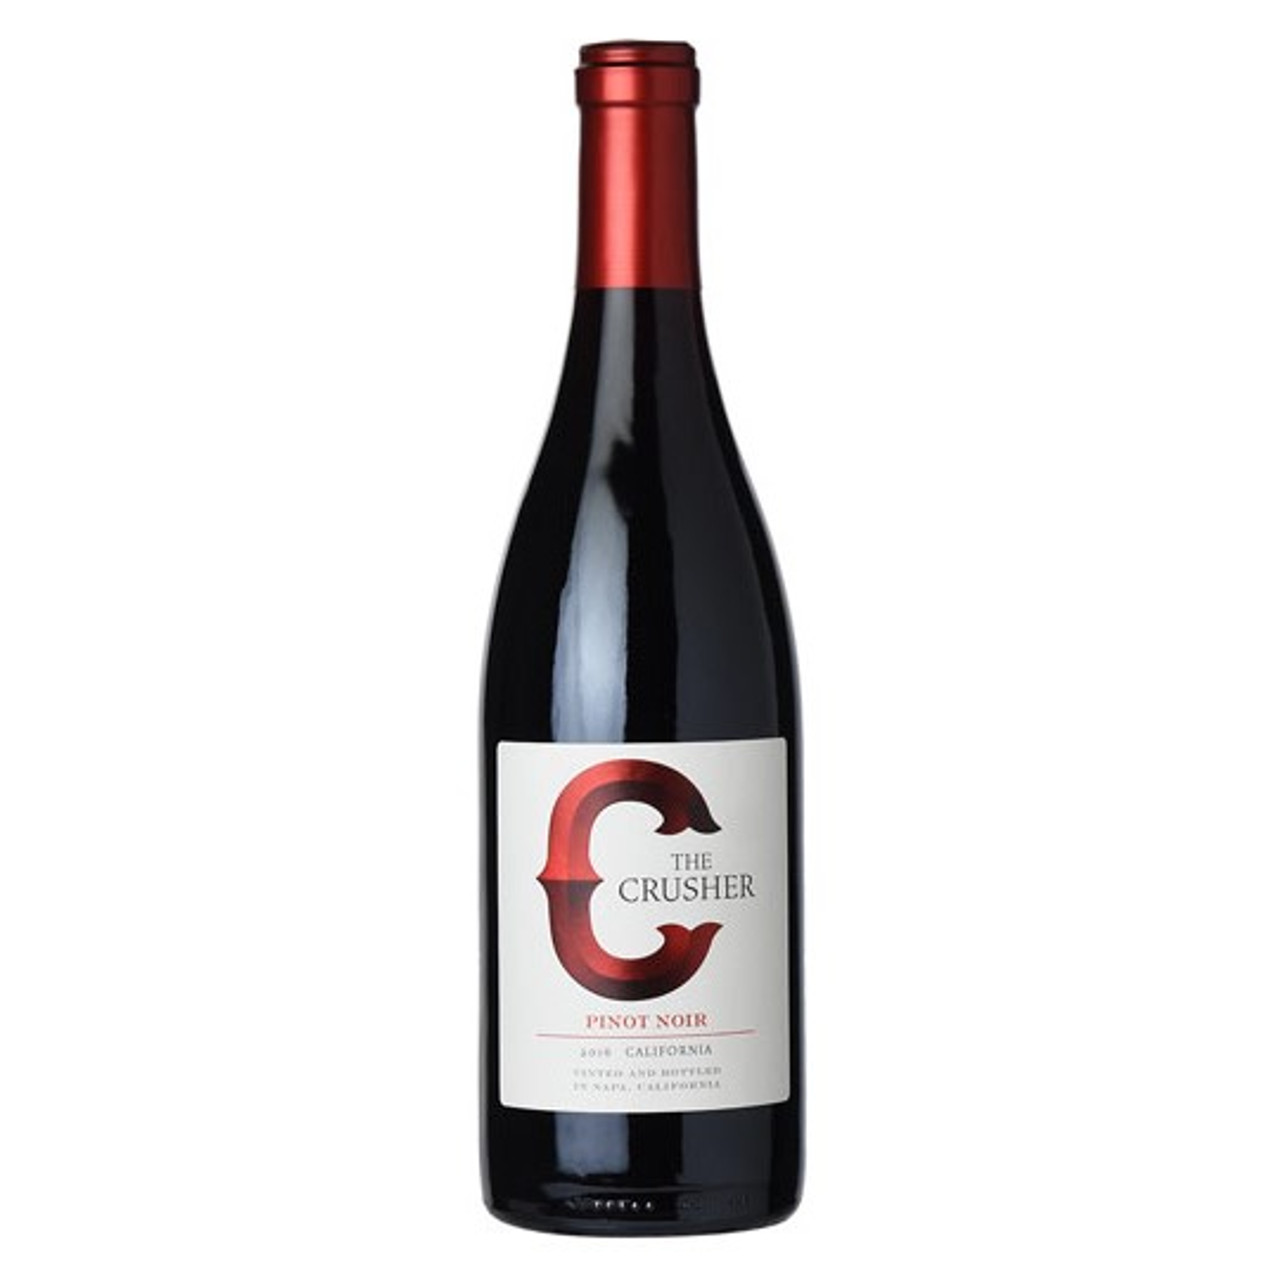 The Crusher, Pinot Noir Grower's Selection Clarksburg 2016